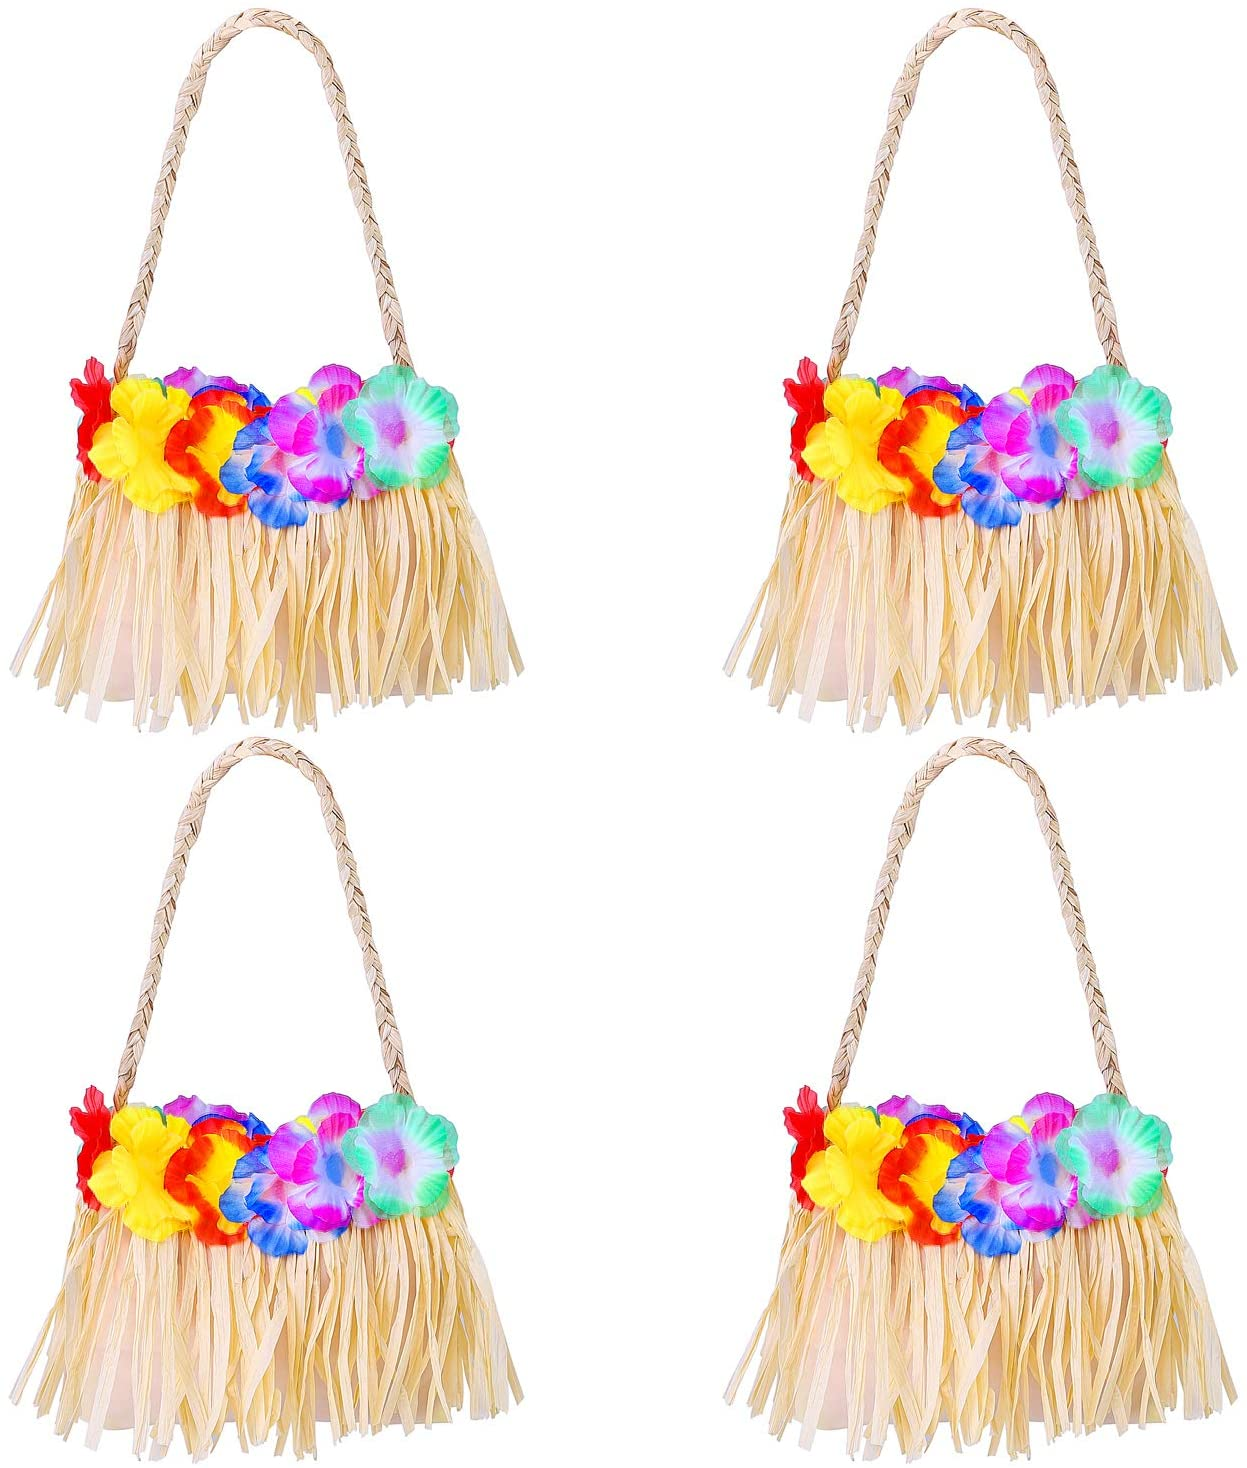 URATOT 4 Pack Hawaiian Handbag Women Hawaiian Fancy Dress Accessory Handbag with Colorful Flower for Luau Beach Party